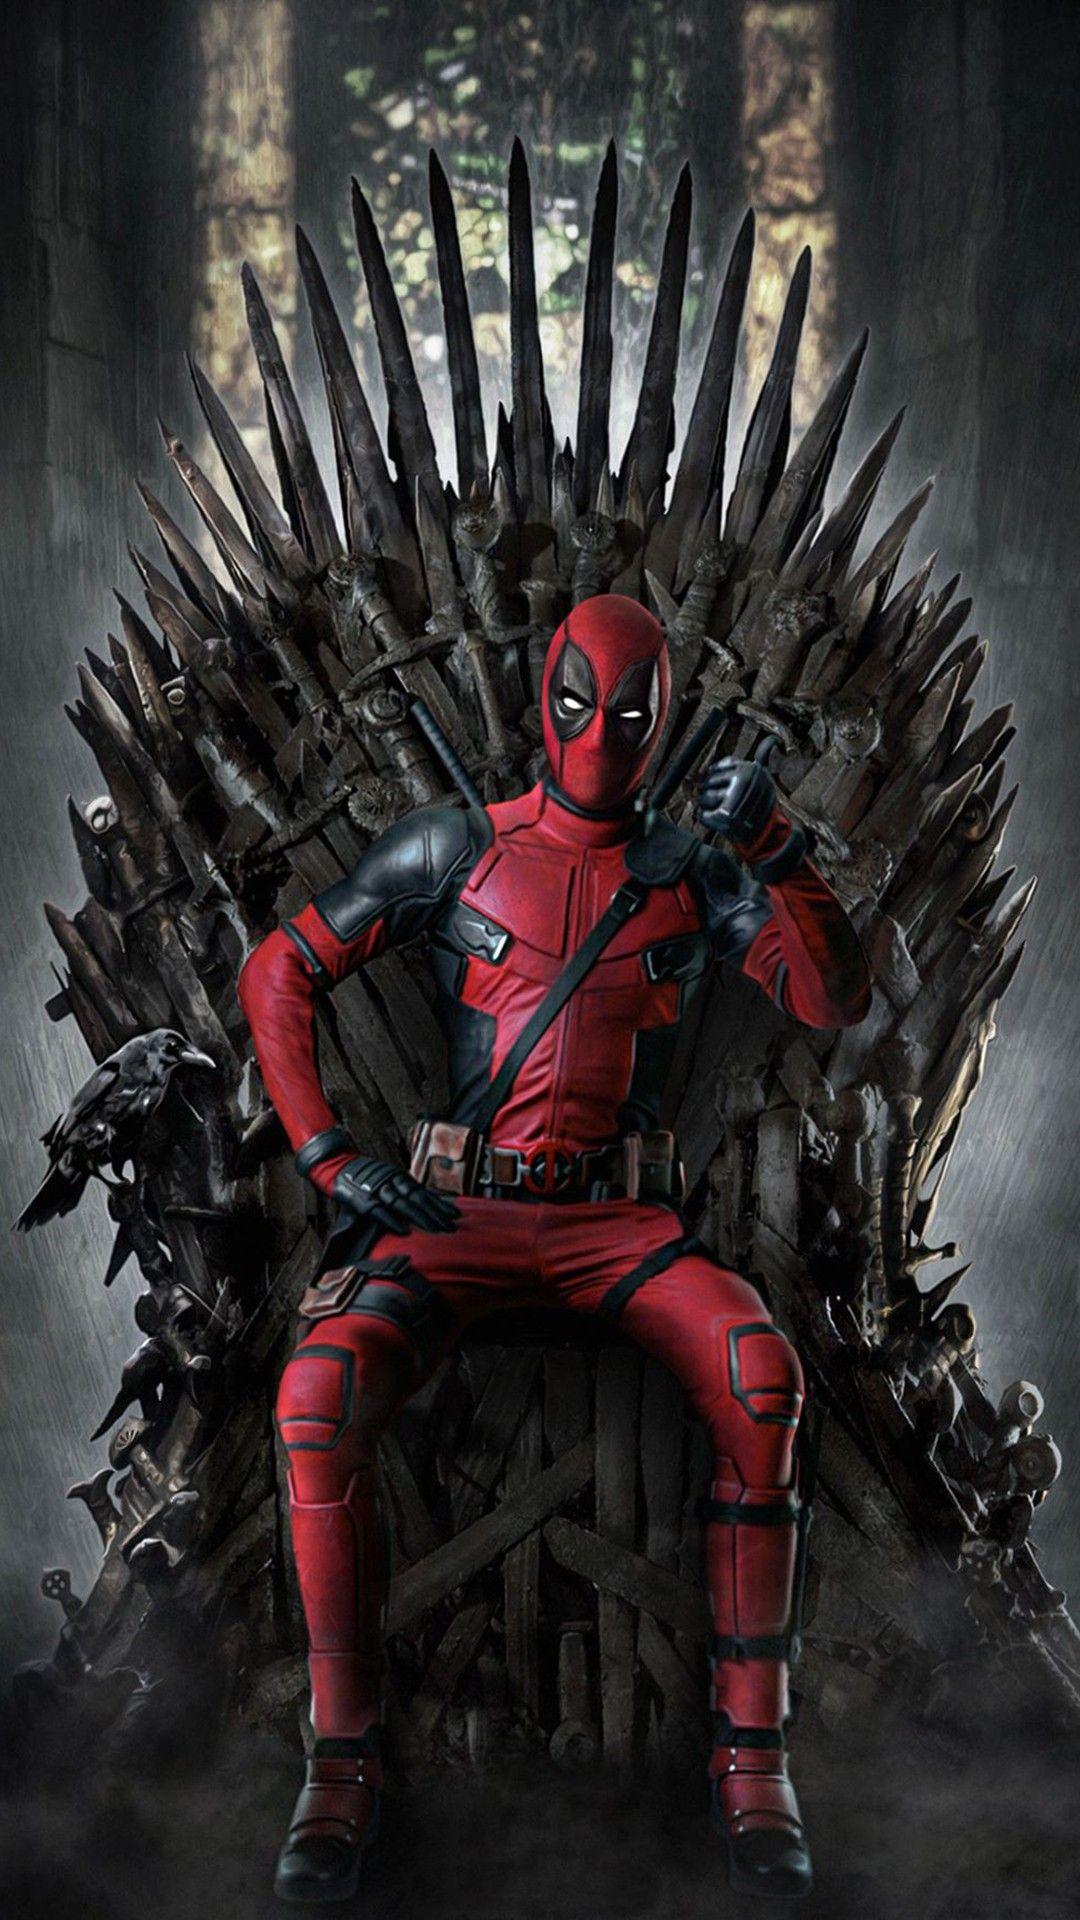 Deadpool Hd Wallpaper 4K Download Pictures